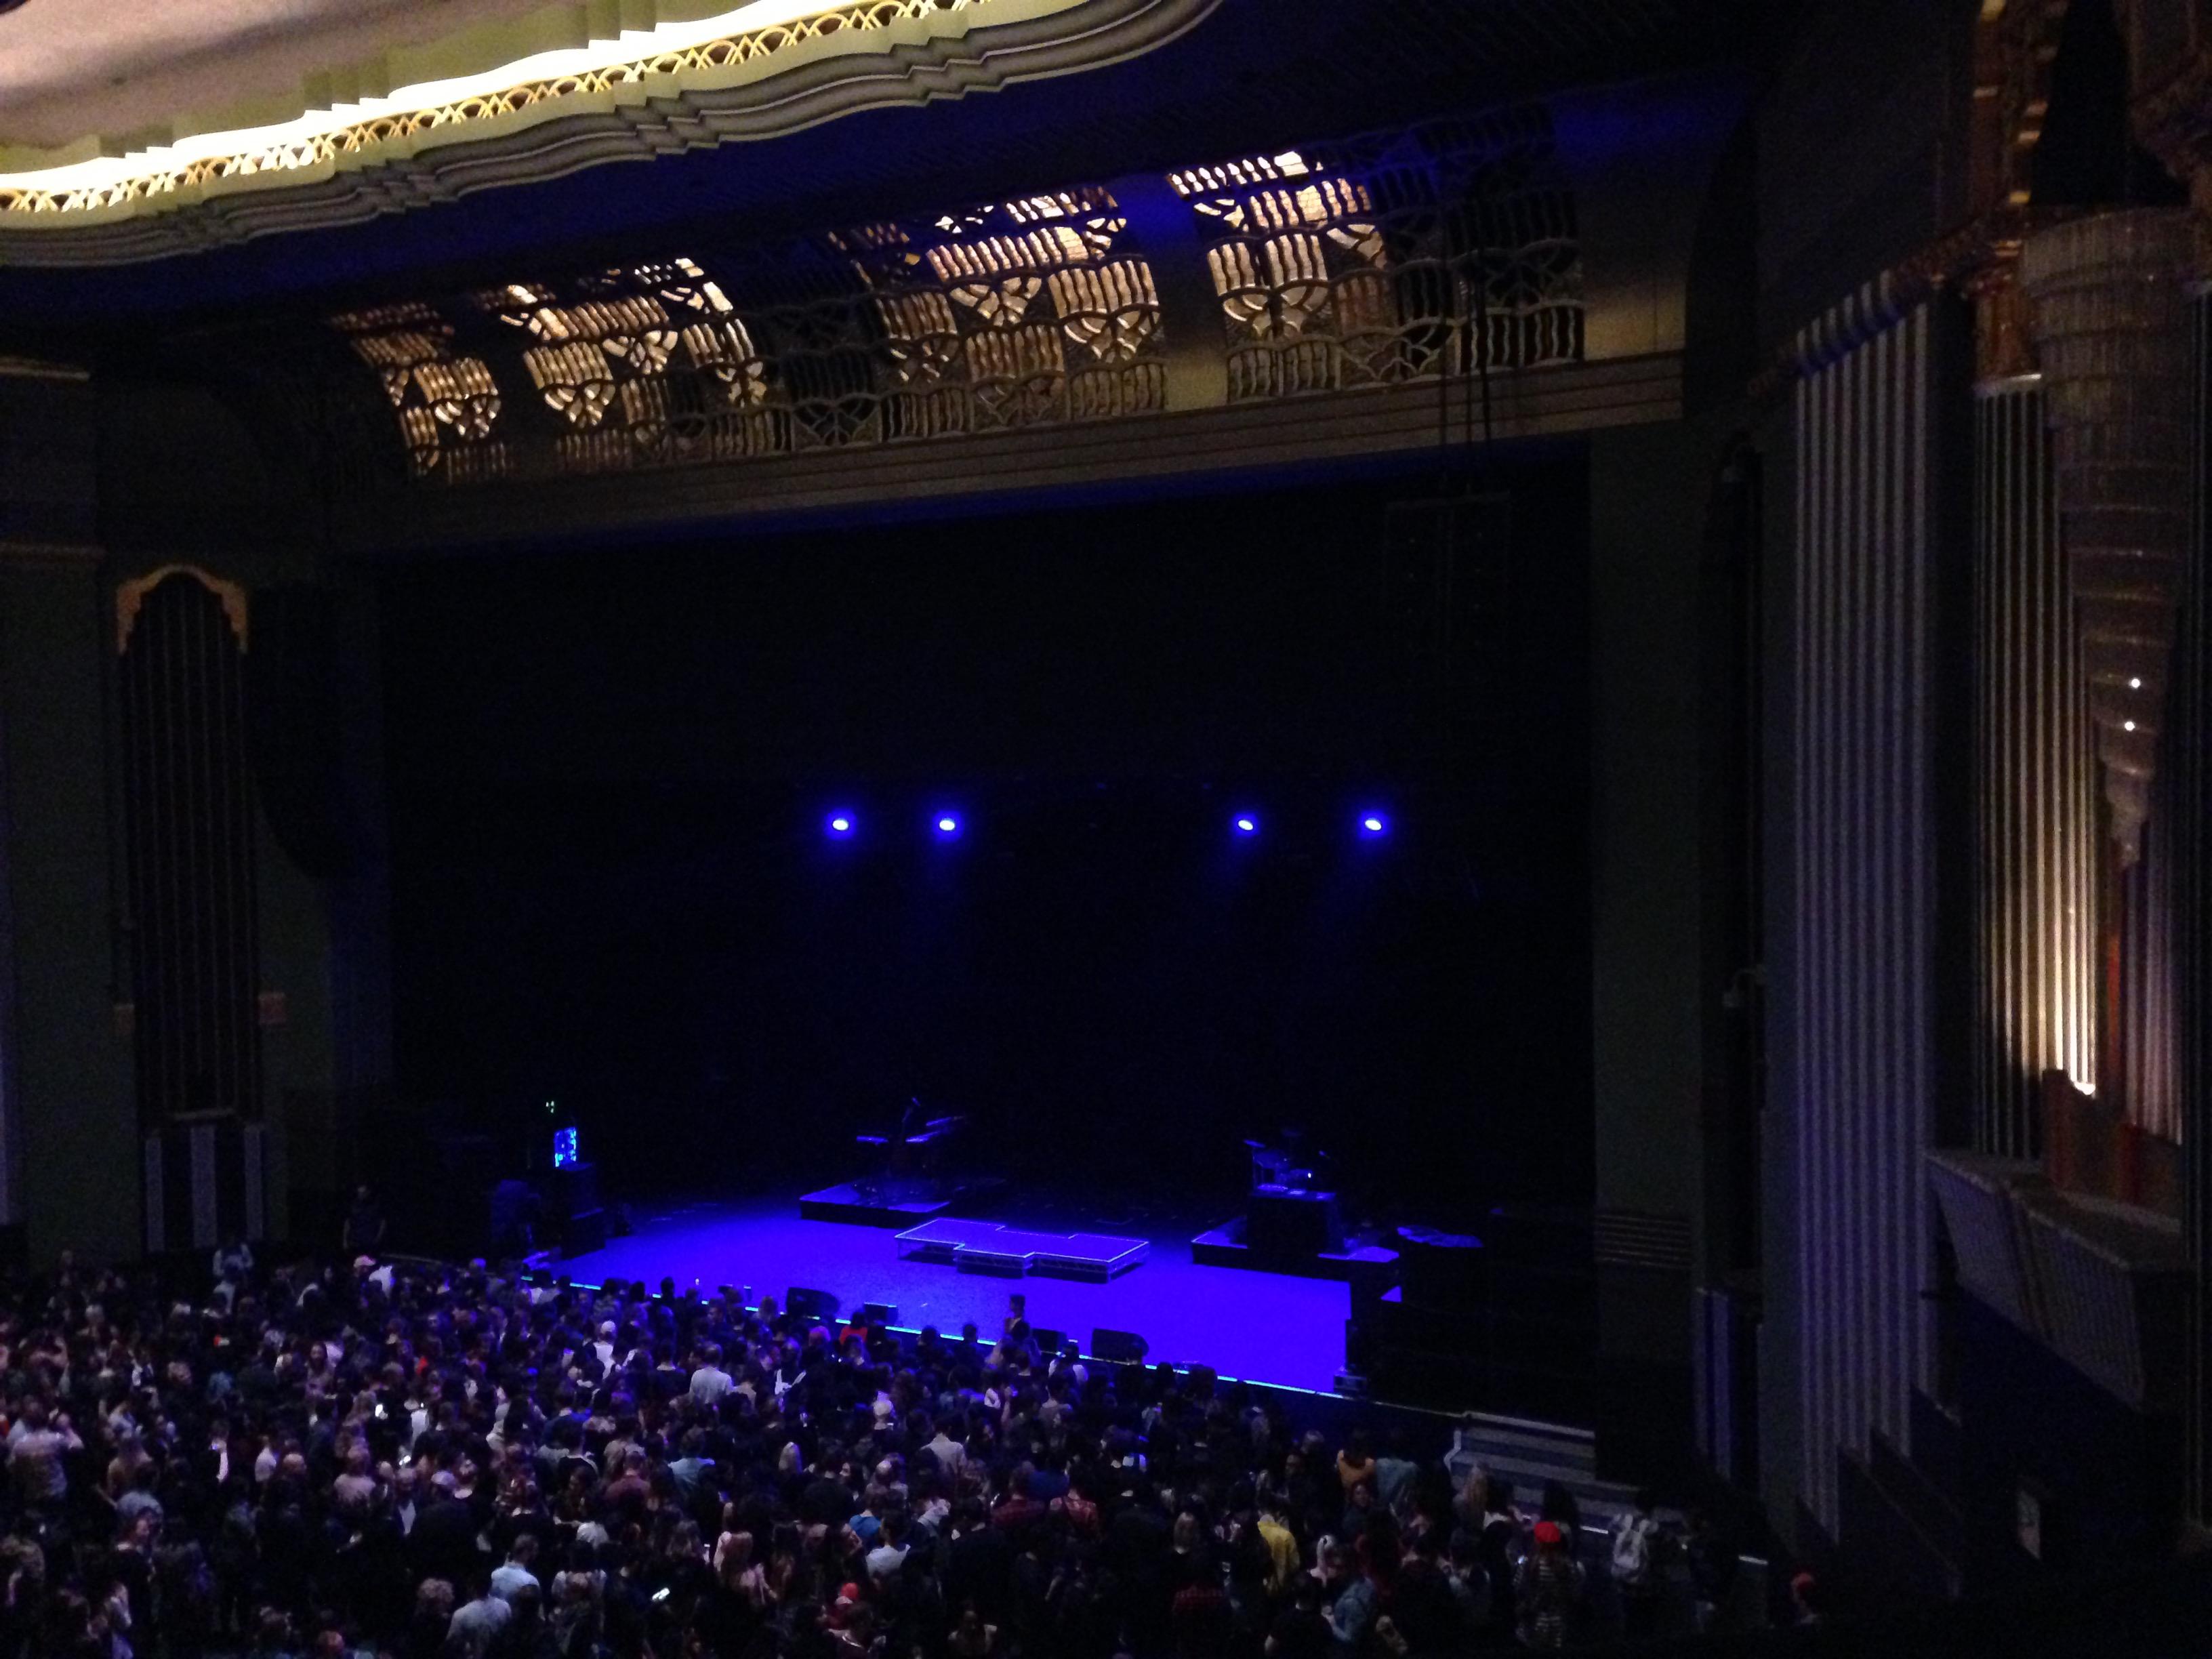 BANKS 25 October 2017 Live at Eventim Apollo Hammersmith London